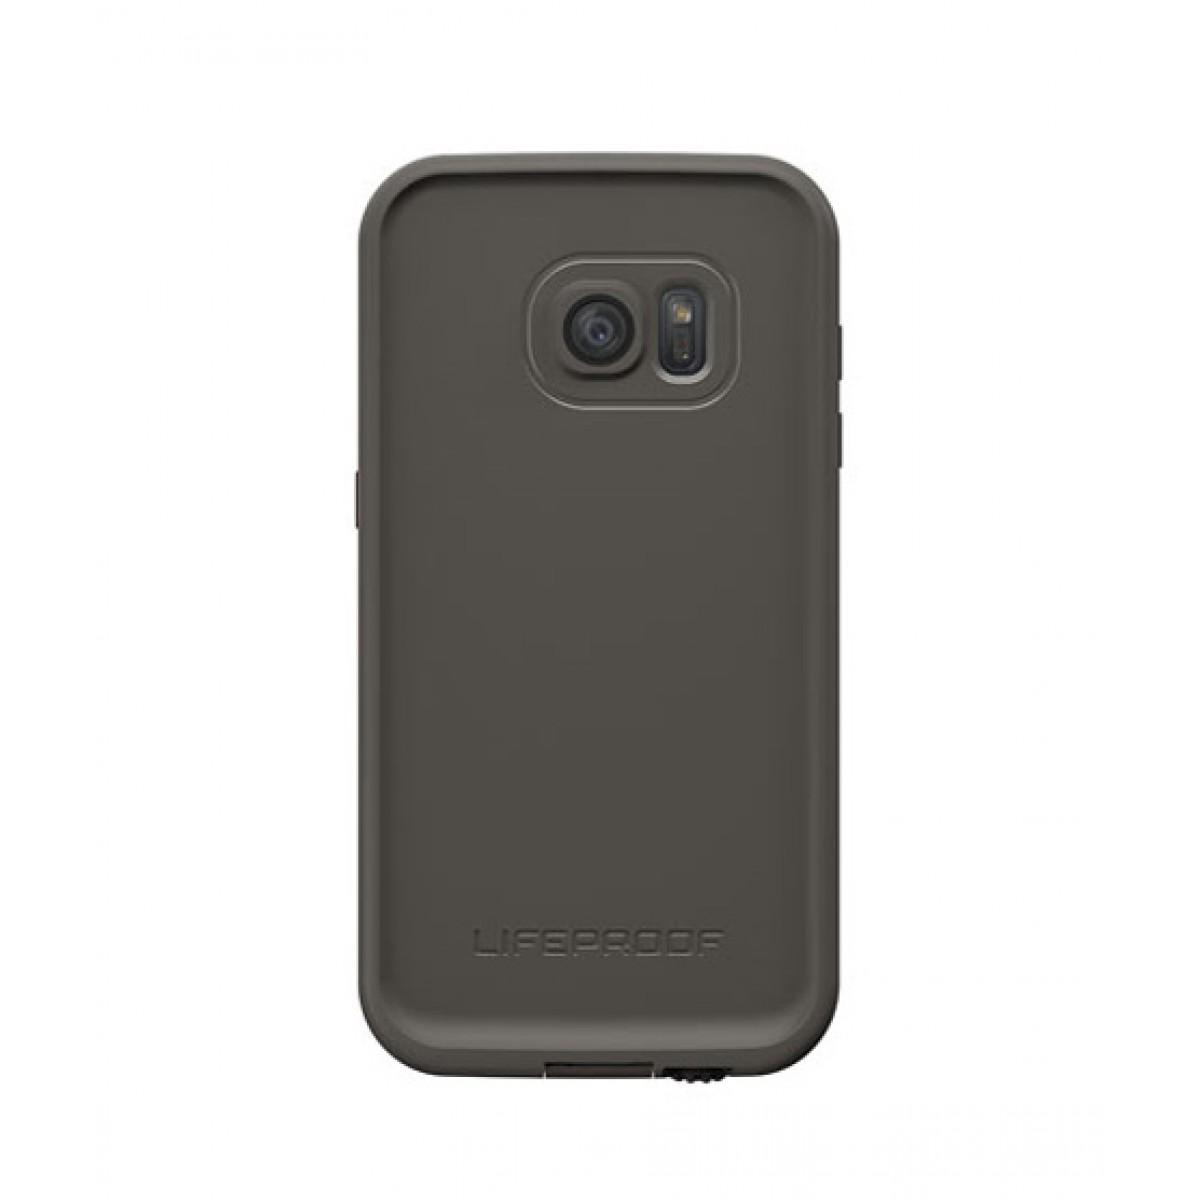 half off d7dd5 107c1 LifeProof Fre Case Grind Grey For Galaxy S7